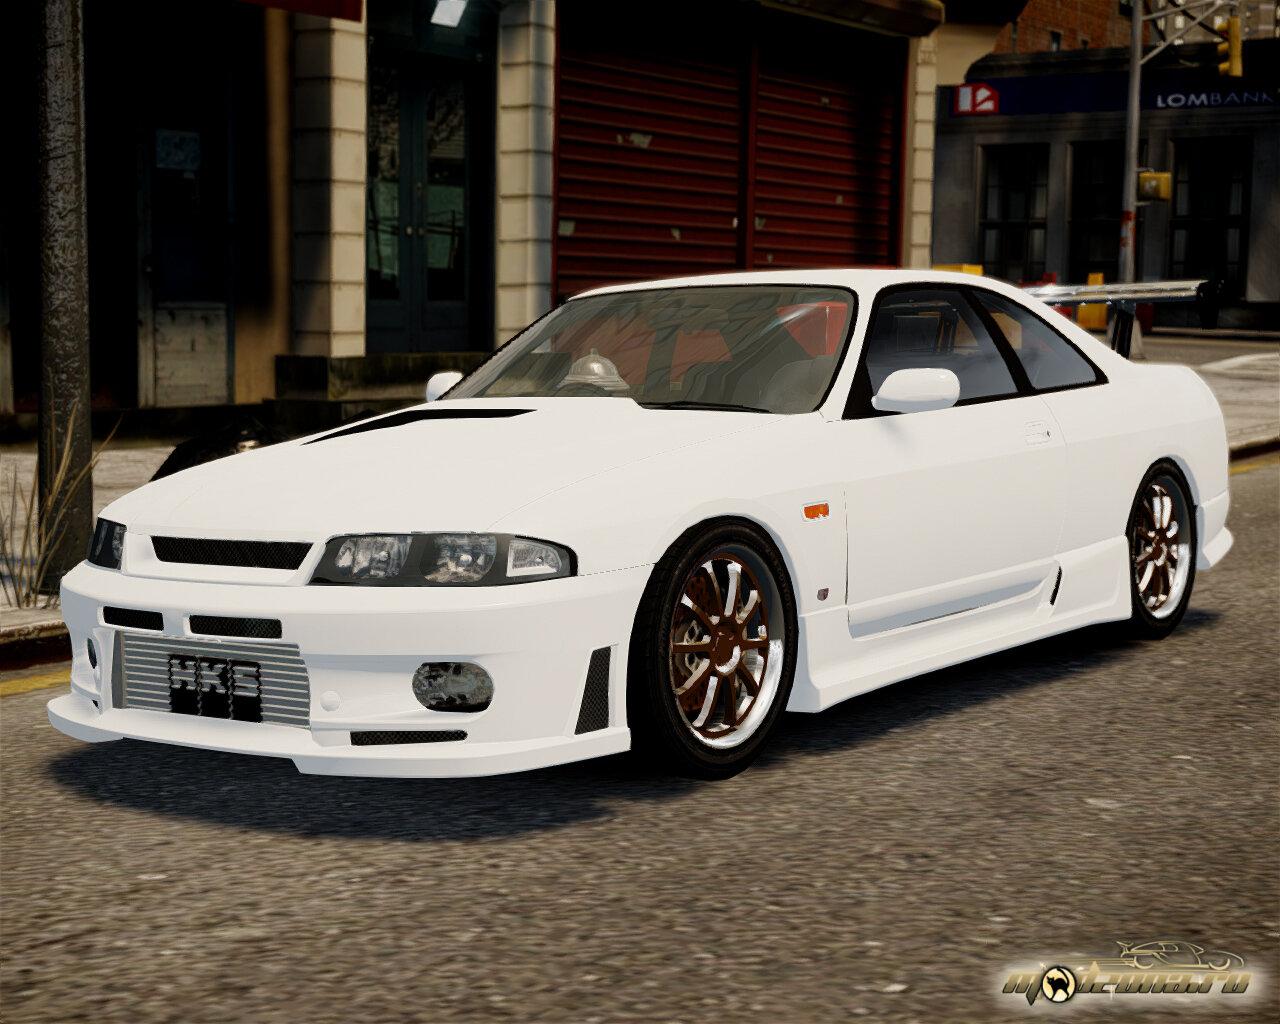 Nissan Skyline GT-R V-spec '1998